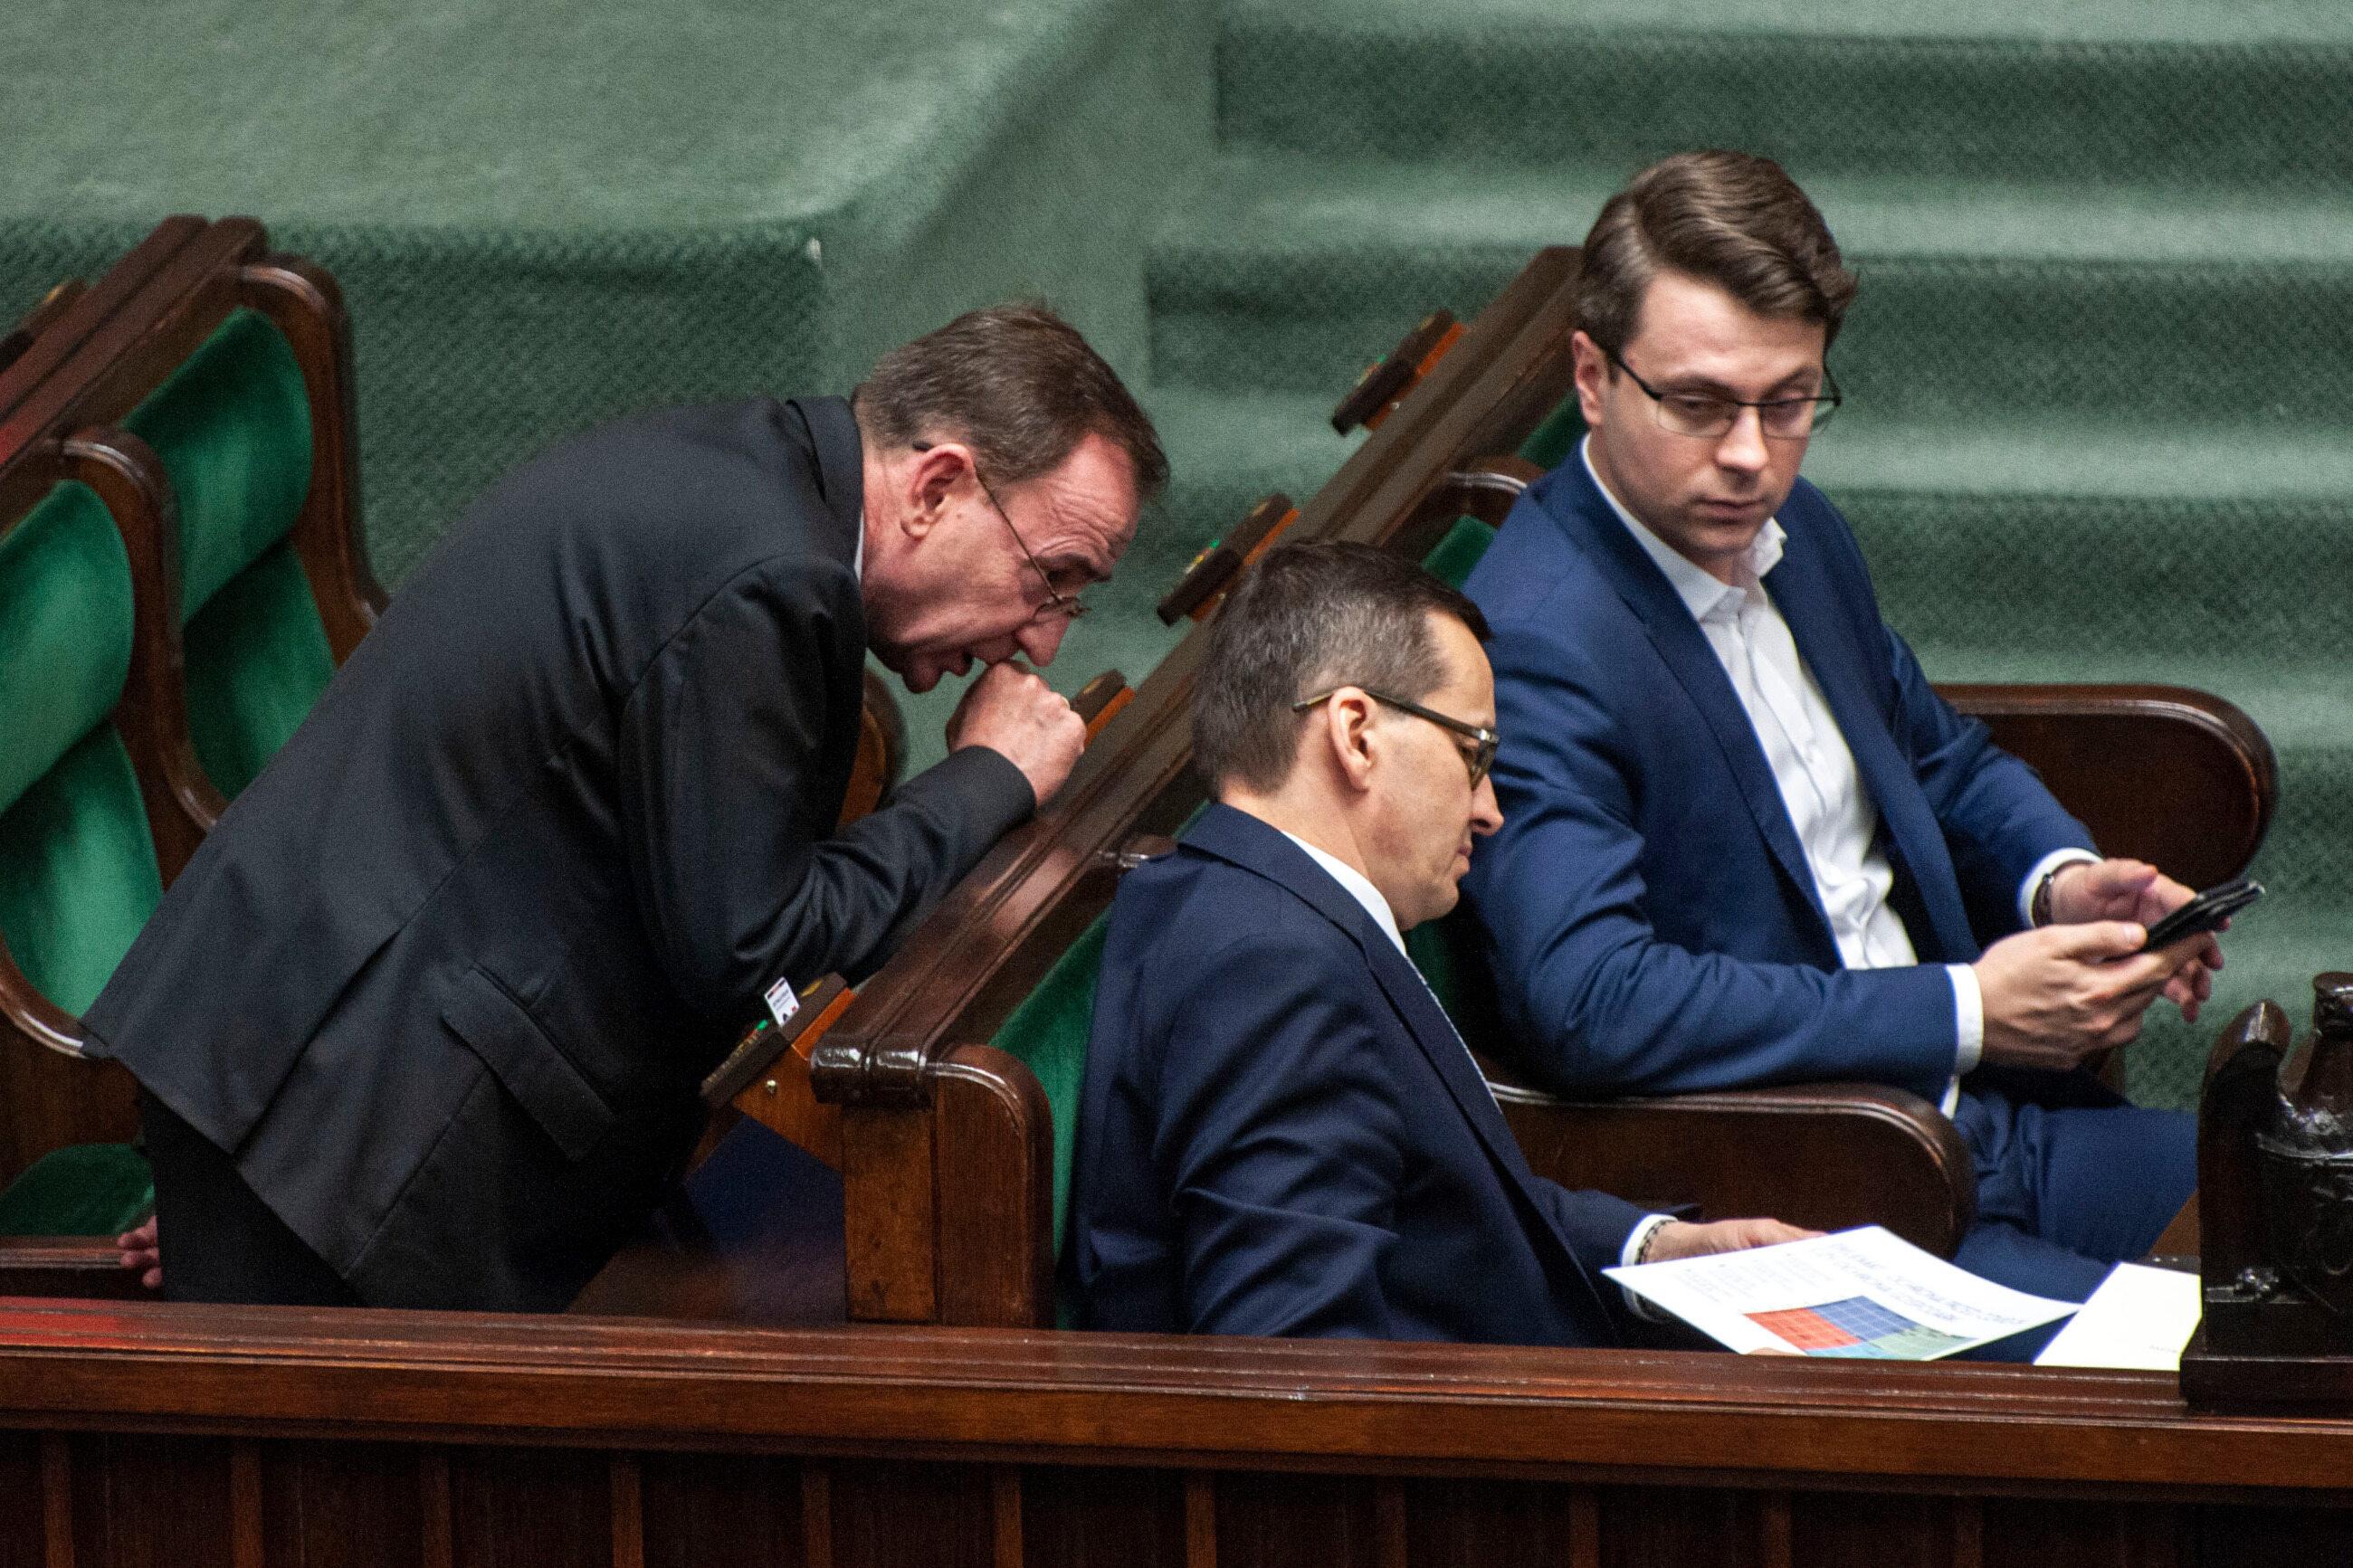 Michał Kamiński, Piotr Müller, Mateusz Morawiecki